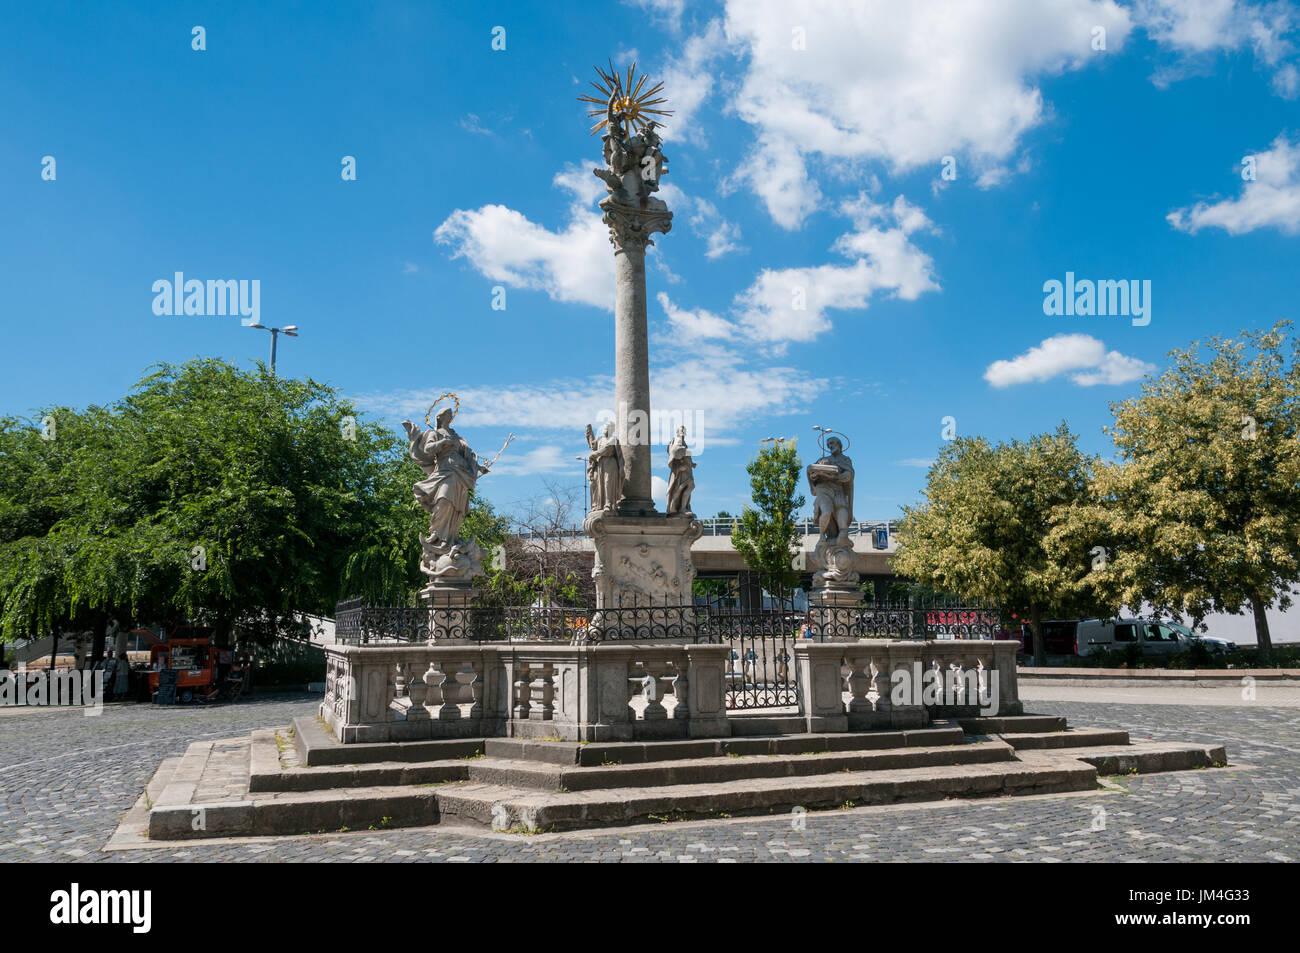 Holy Trinity Column, Bratislava, Slovakia - Stock Image